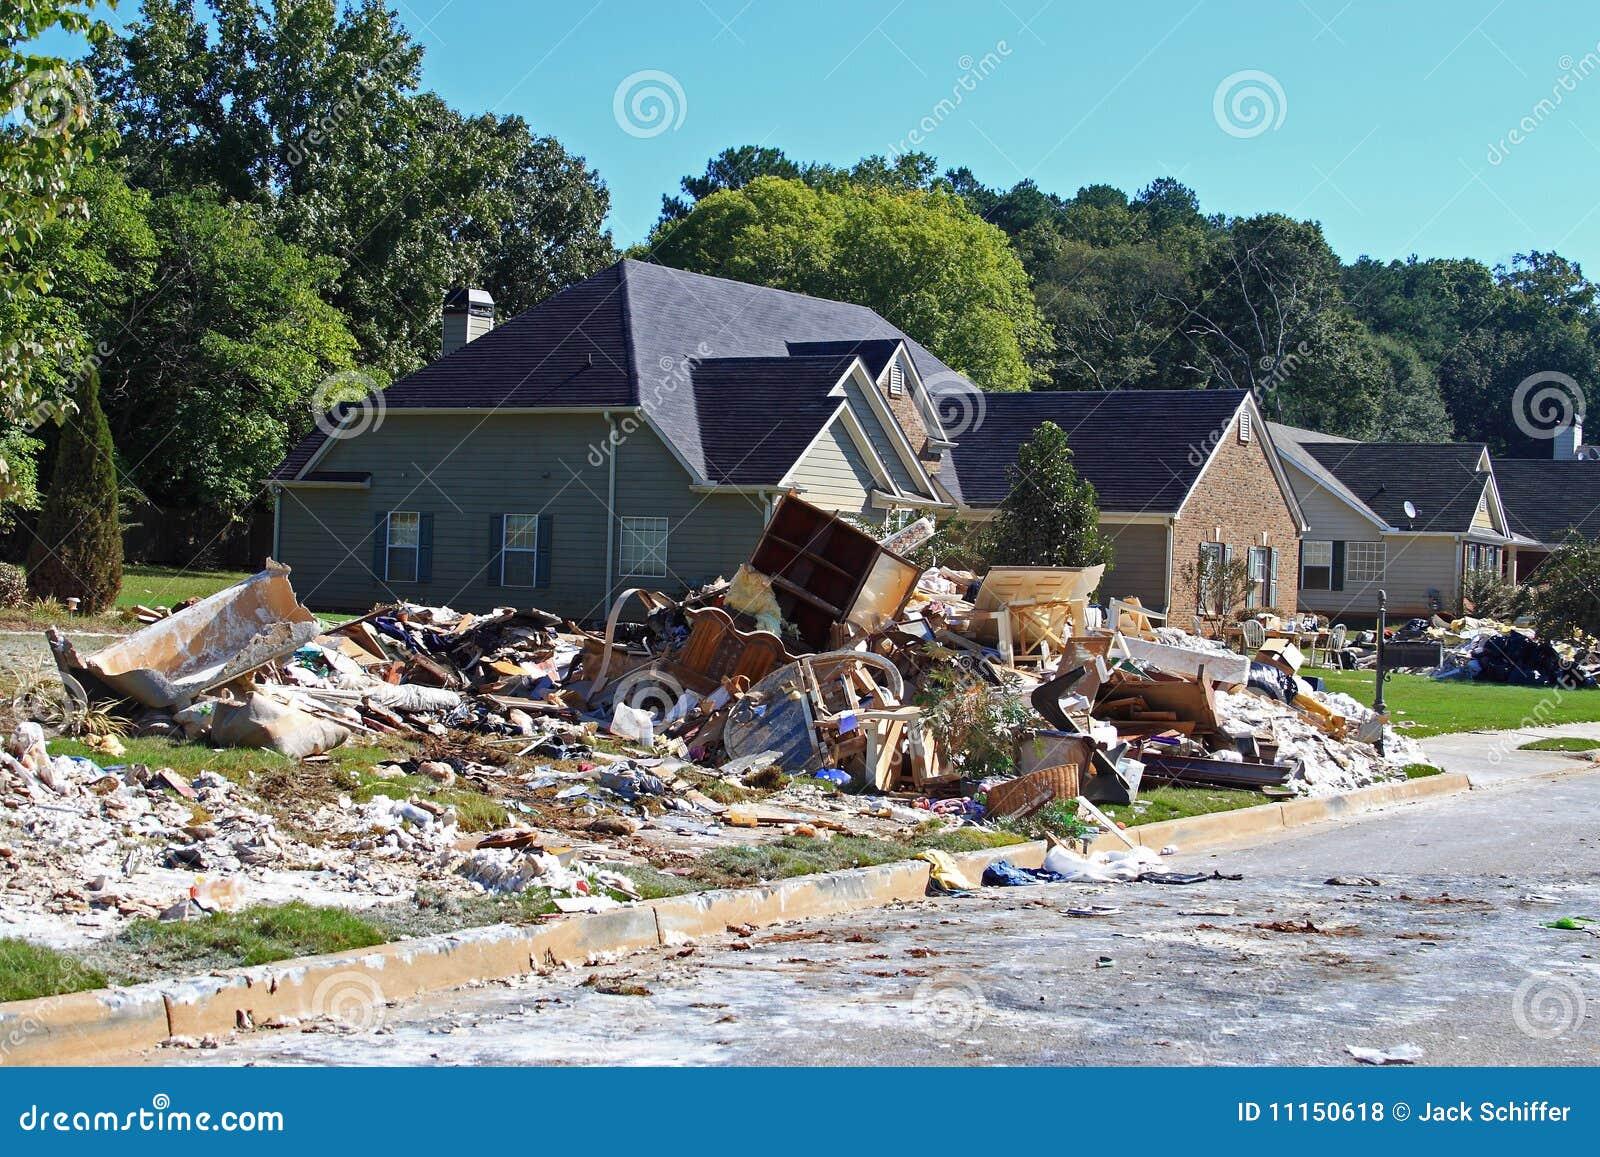 Flood Cleanup